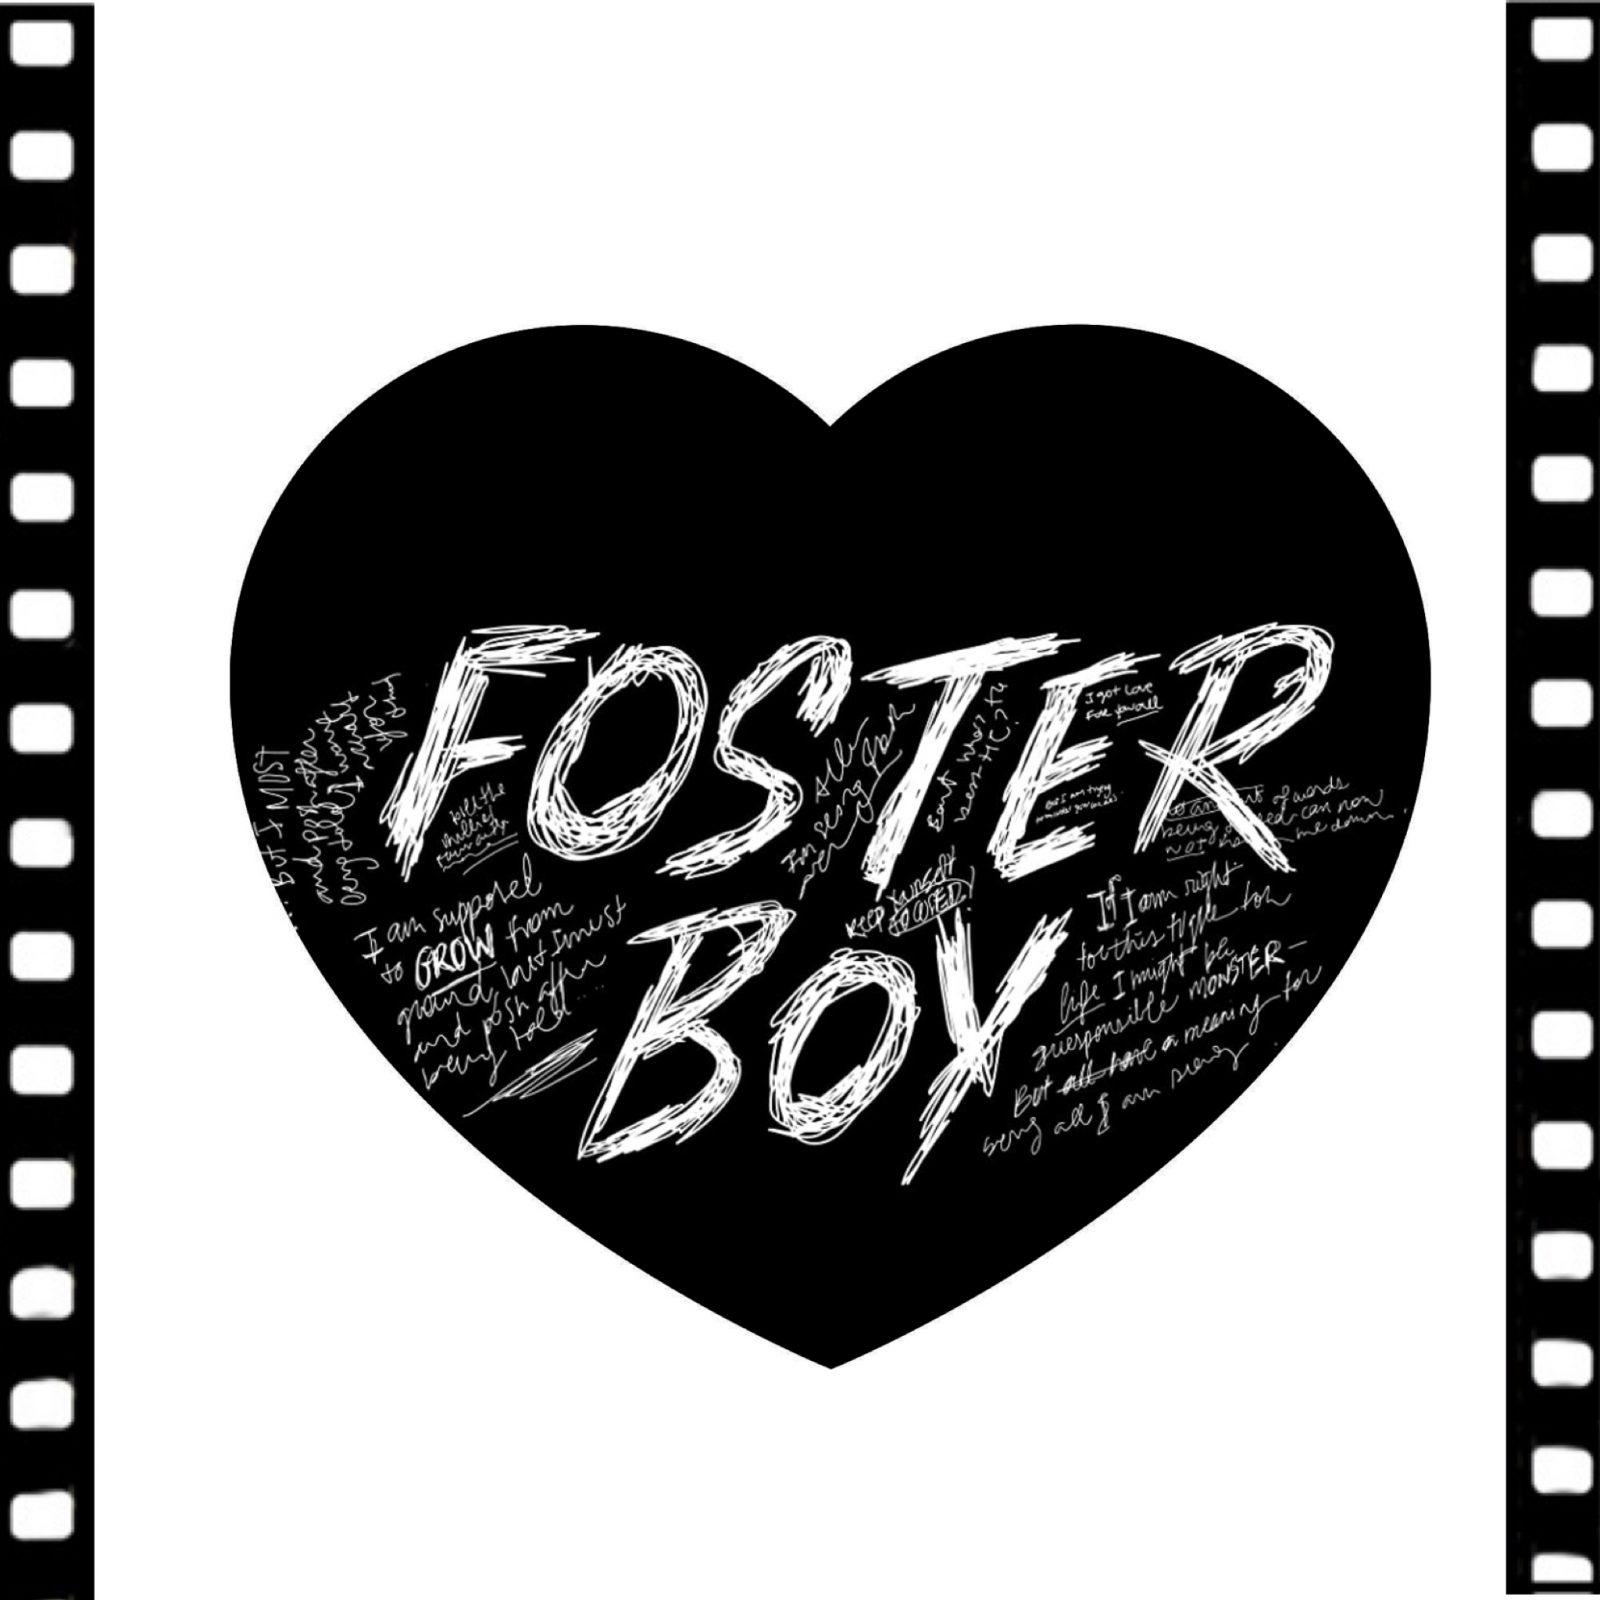 Fosterboy.com